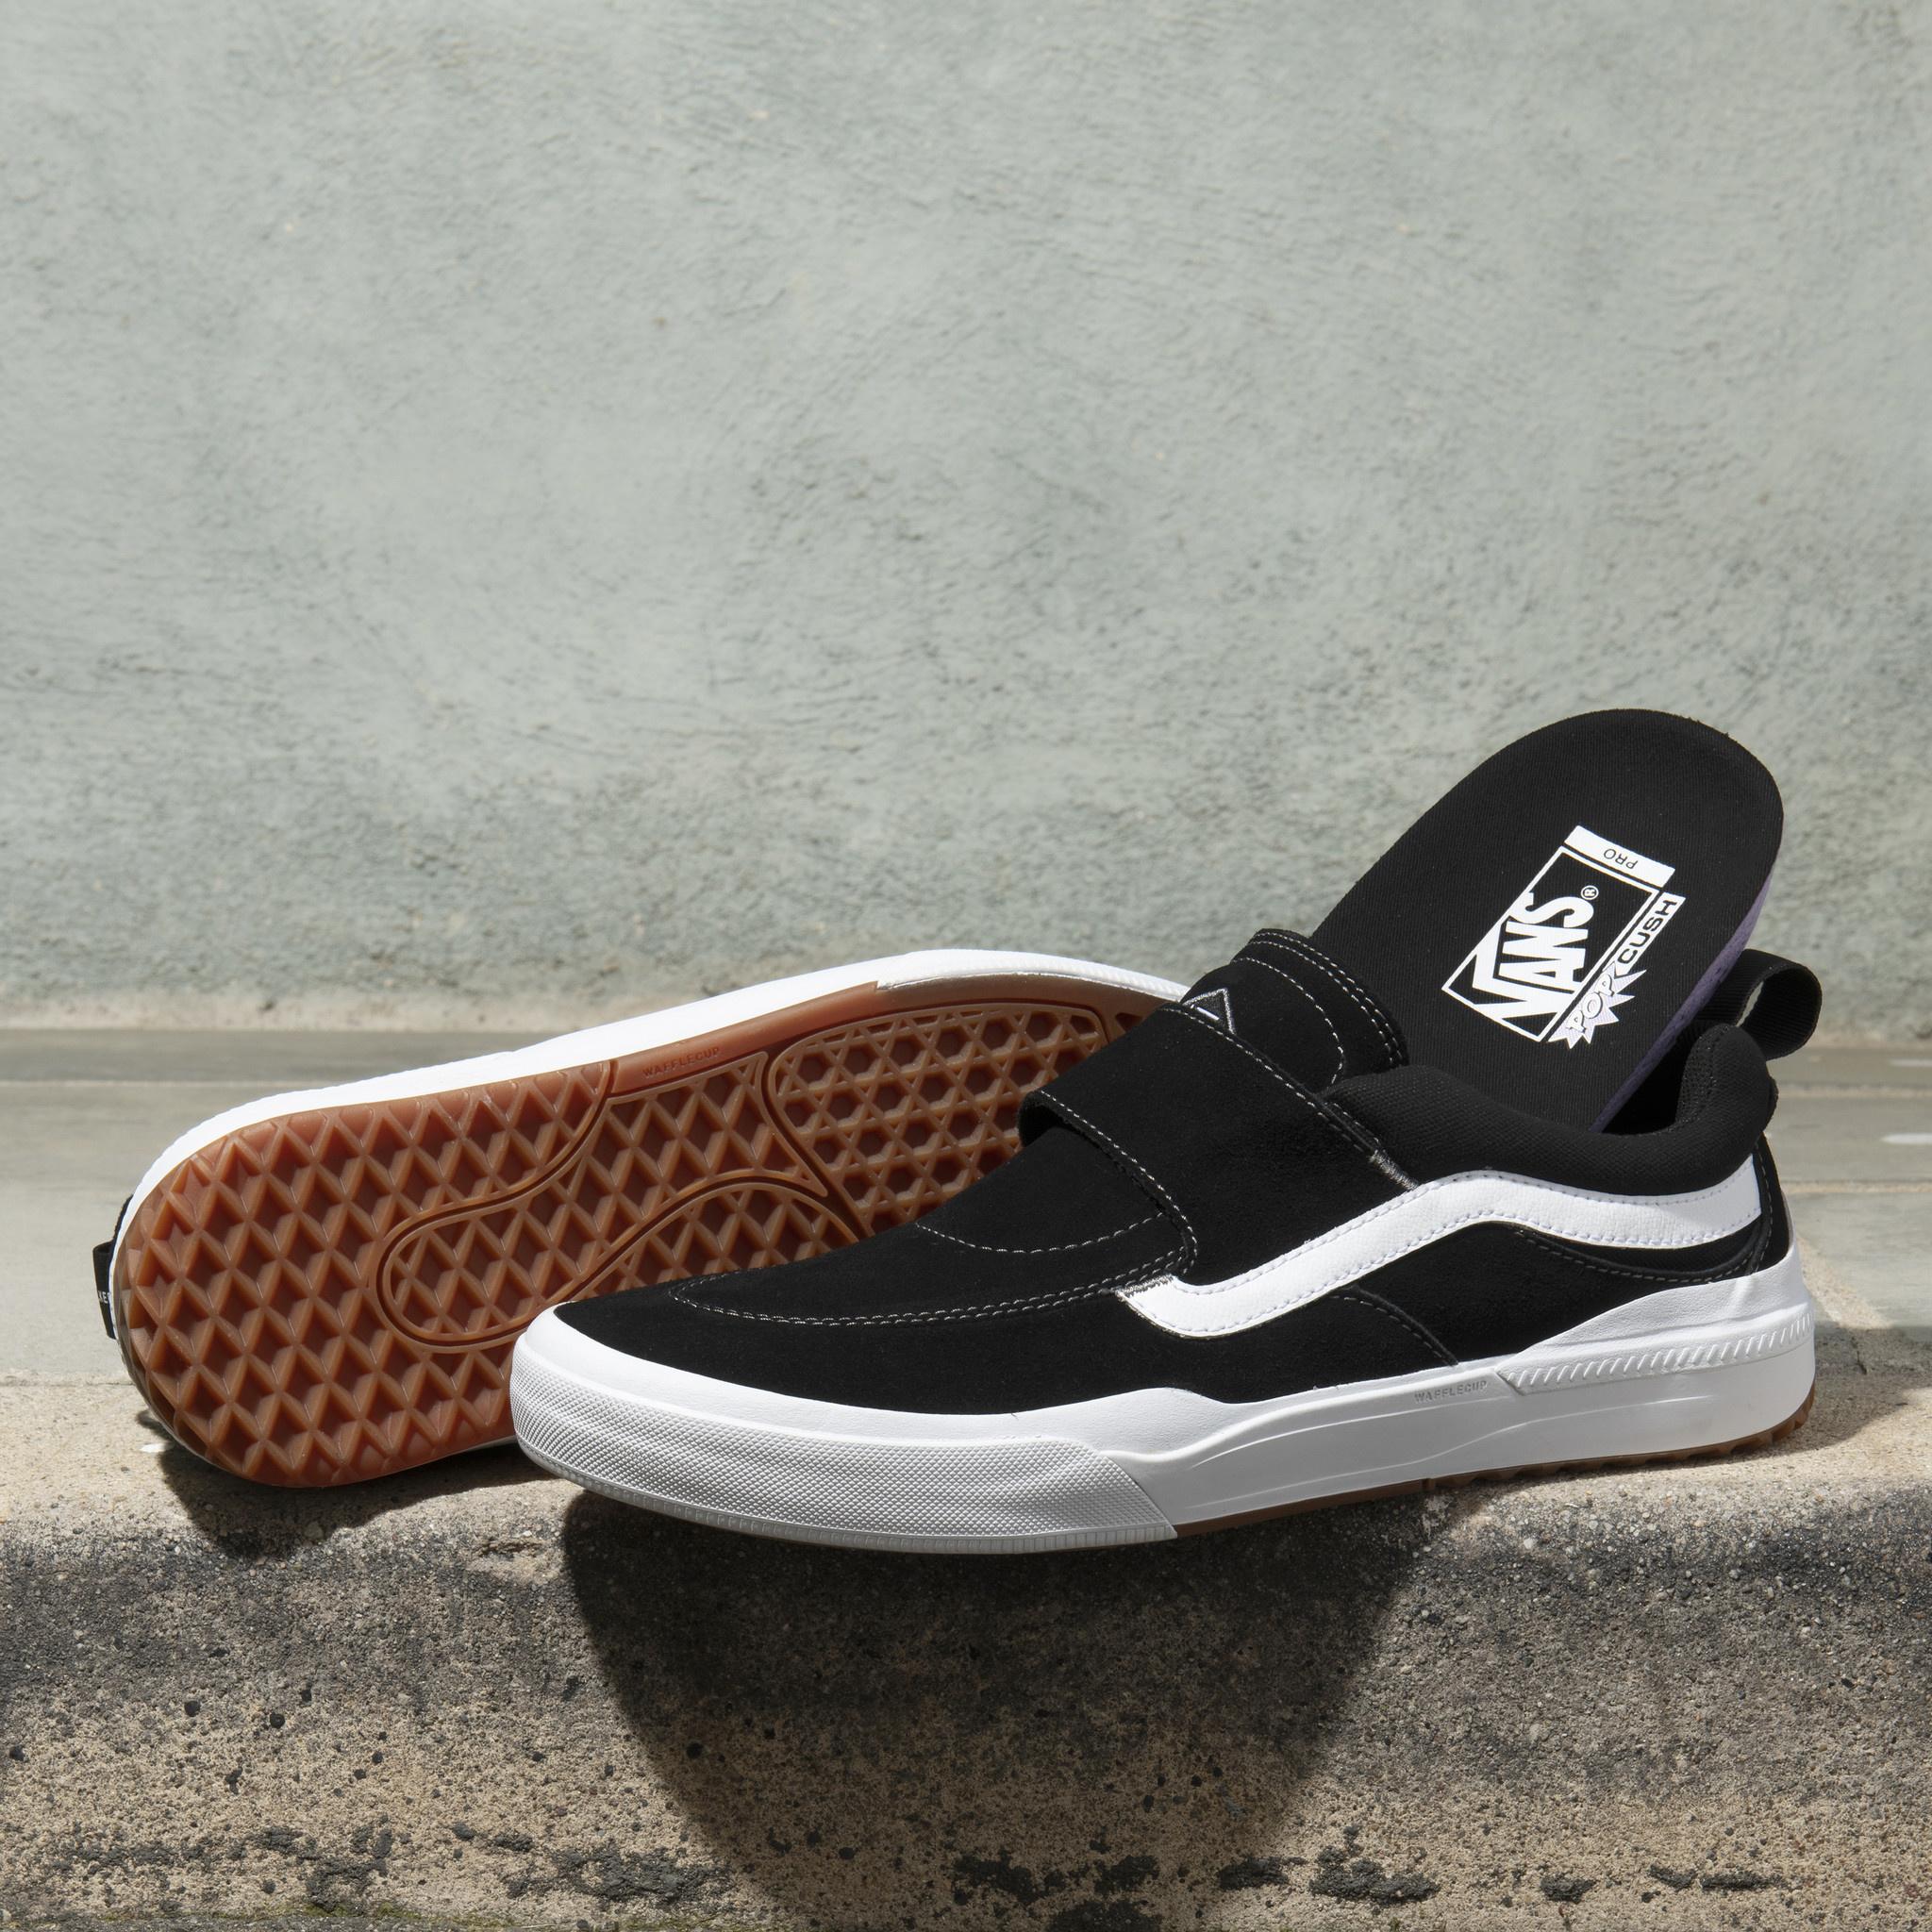 Vans Kyle Pro 2 Shoe - Black/White